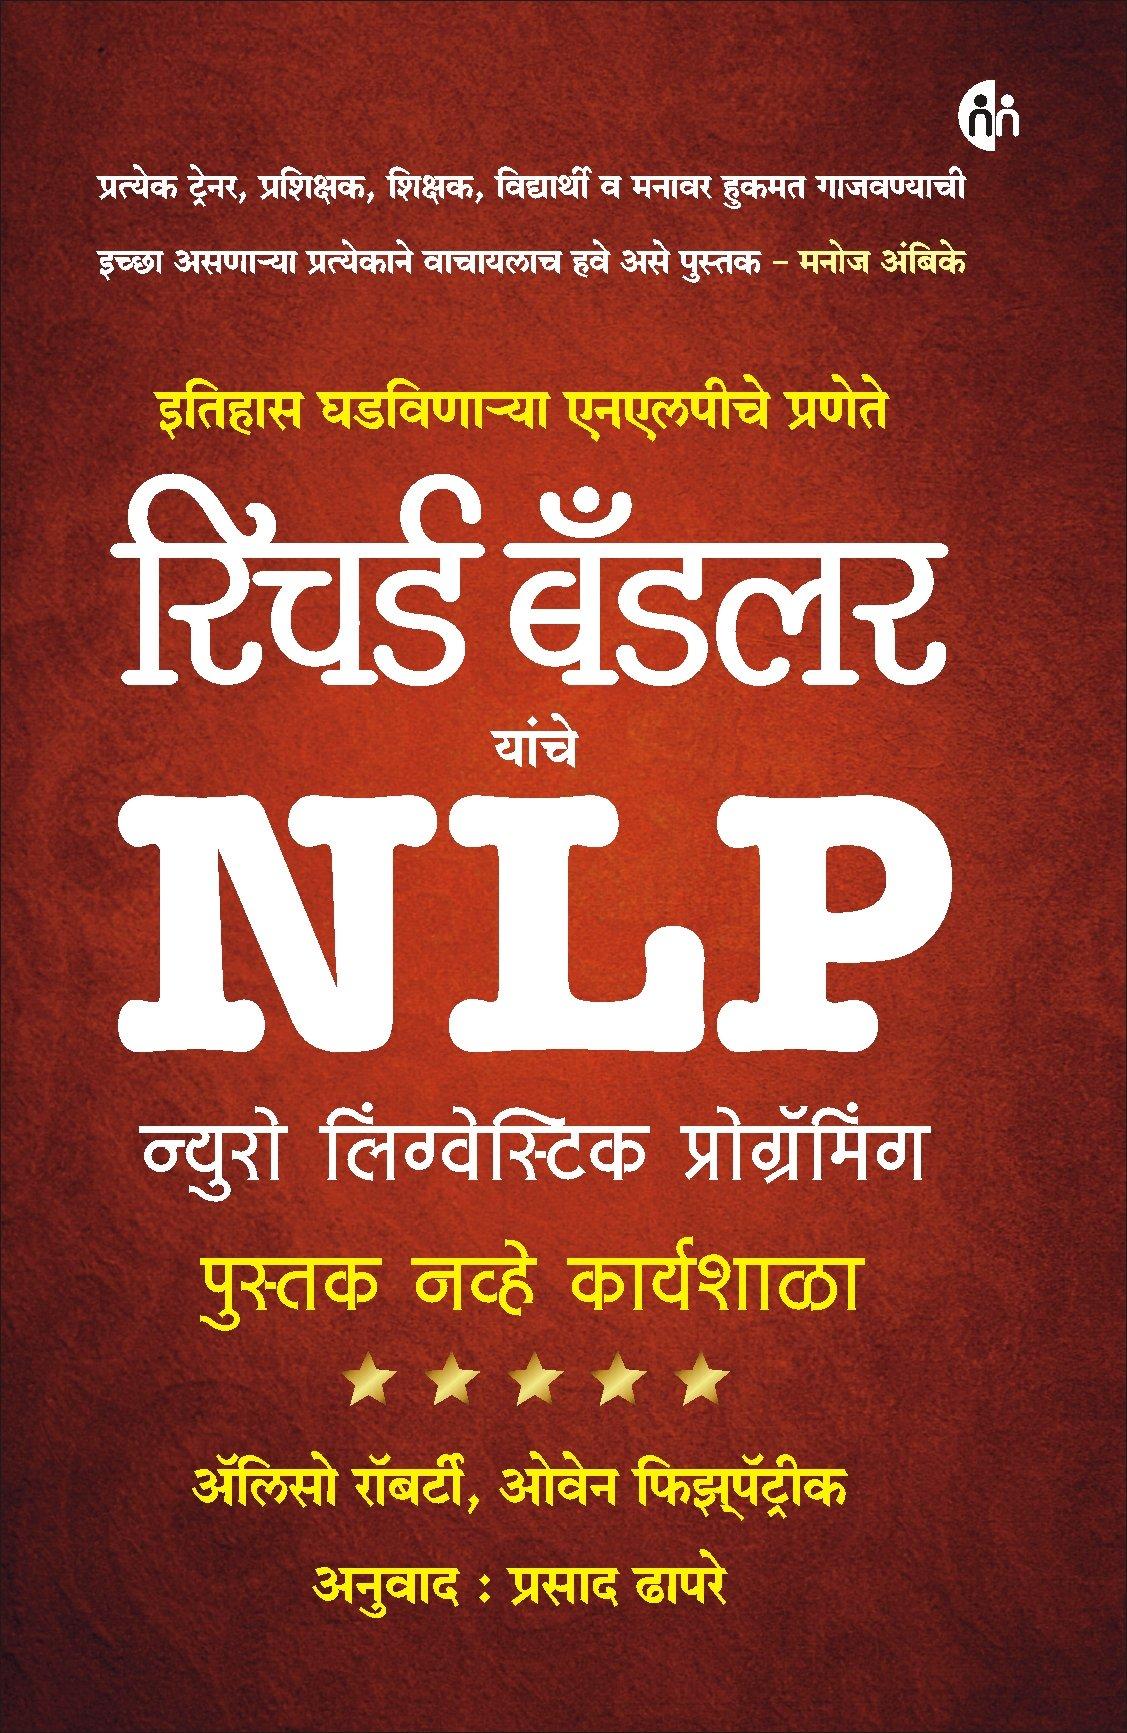 free download nlp books in hindi pdf